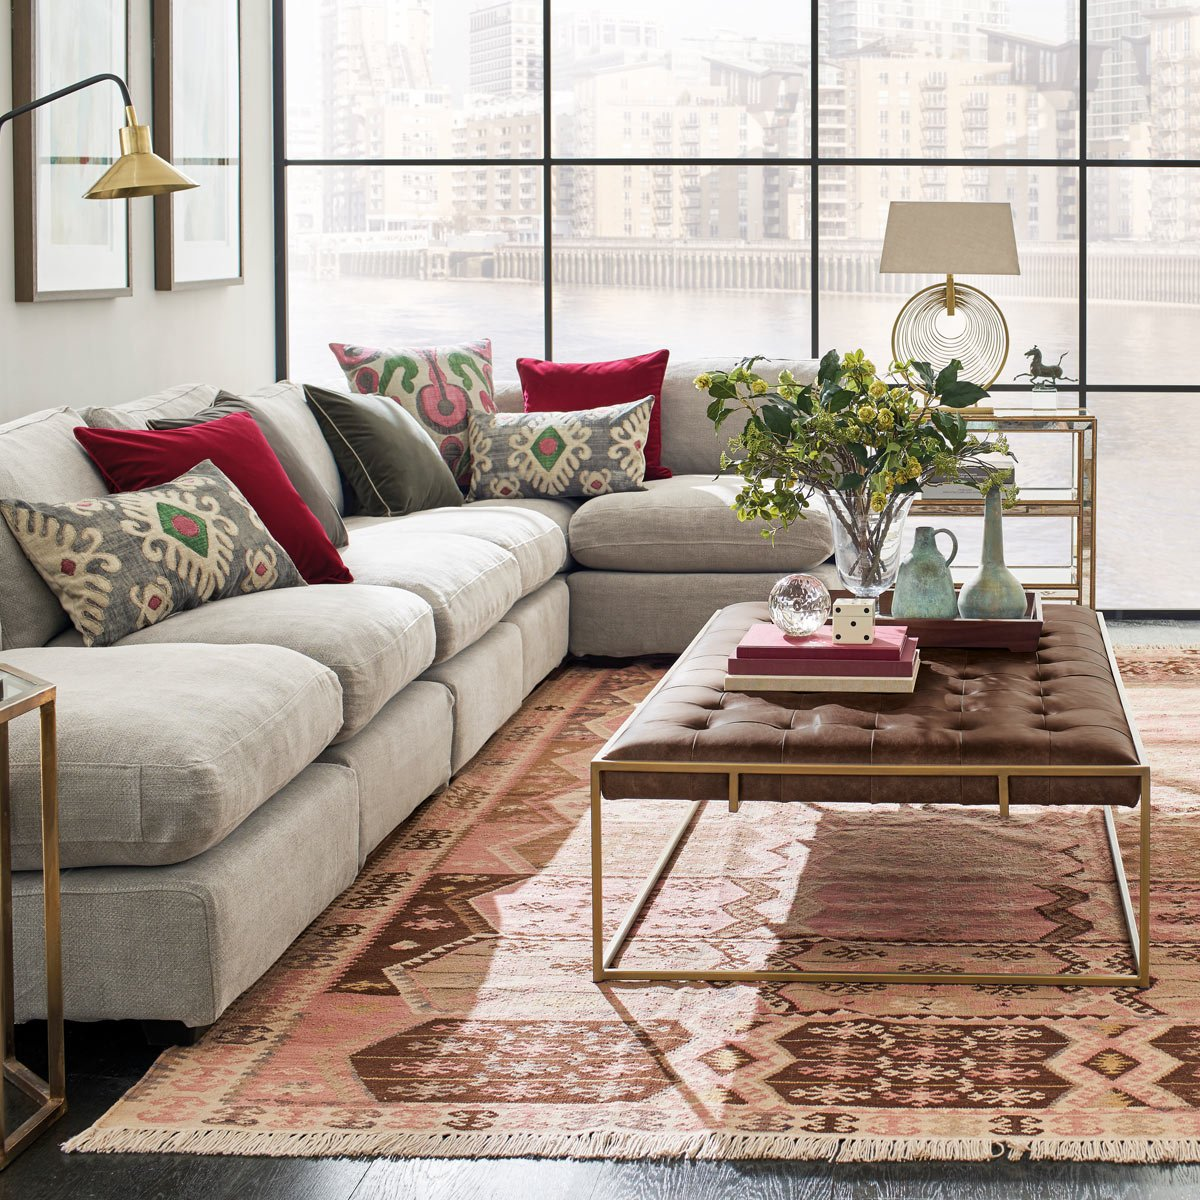 Wallace Coffee Table Ottoman Aged Hazelnut Brown Leather Upholstery OKA Luxury Storage Solution